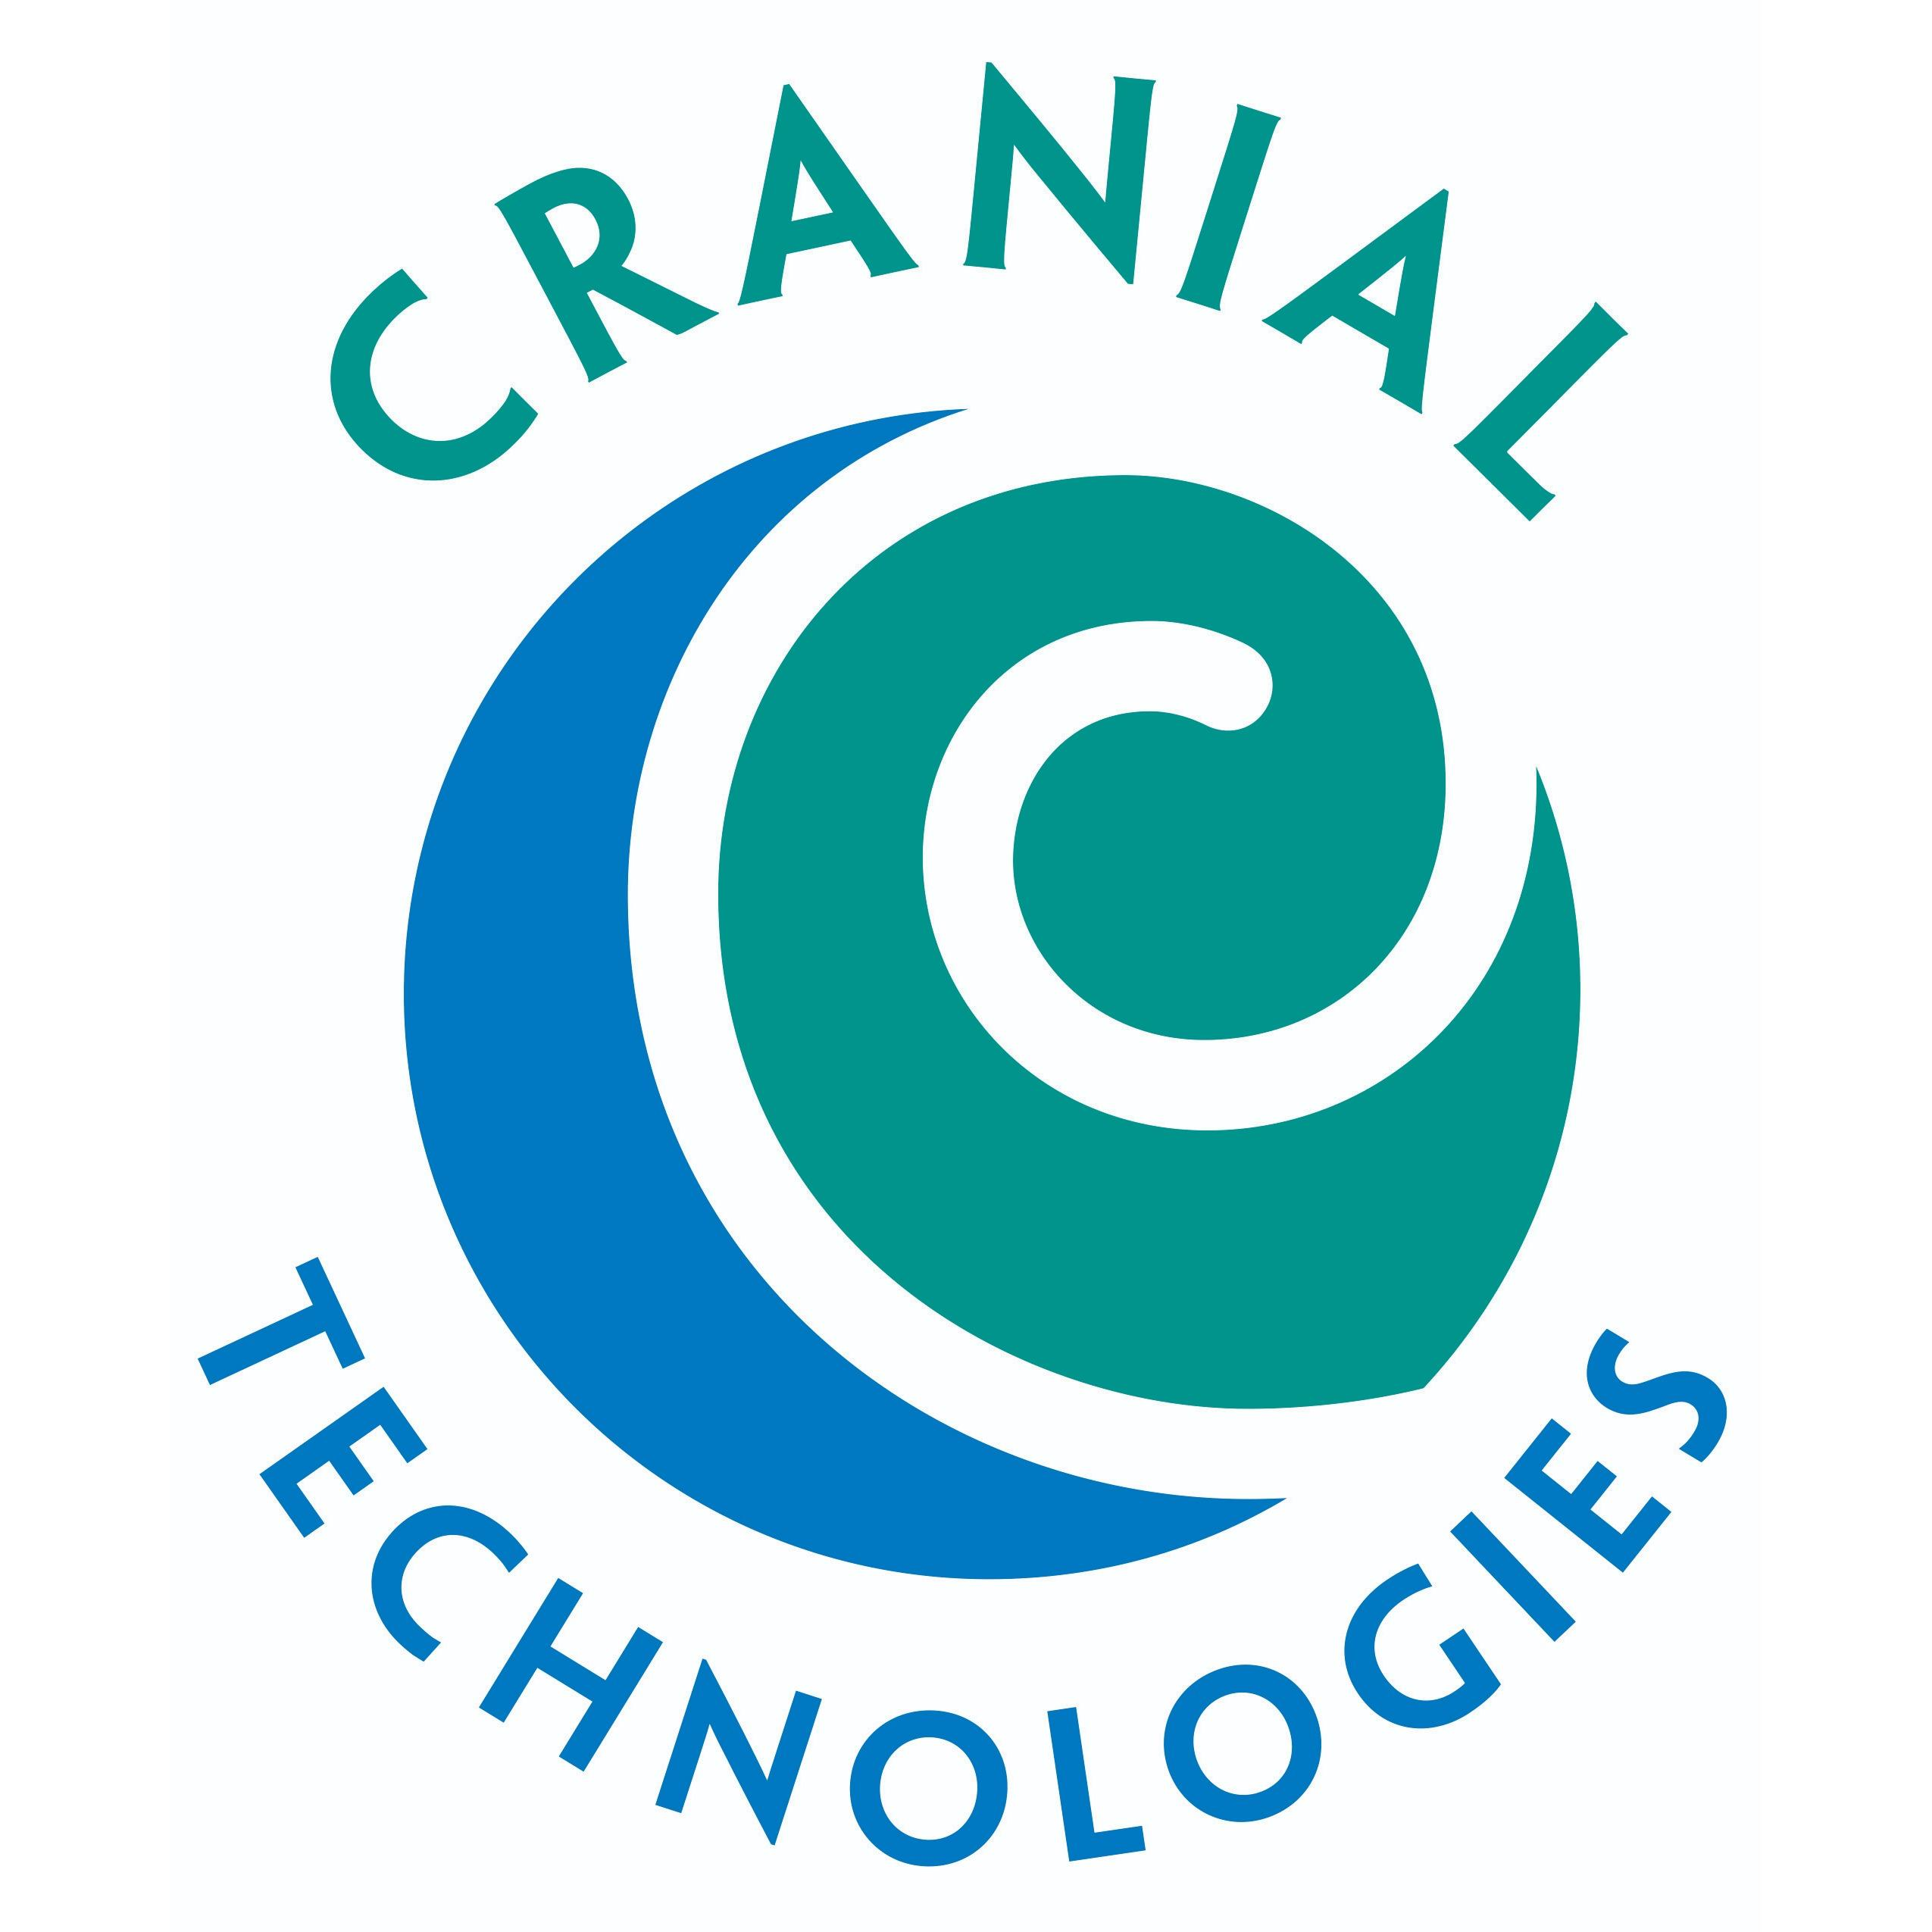 Cranial Technologies